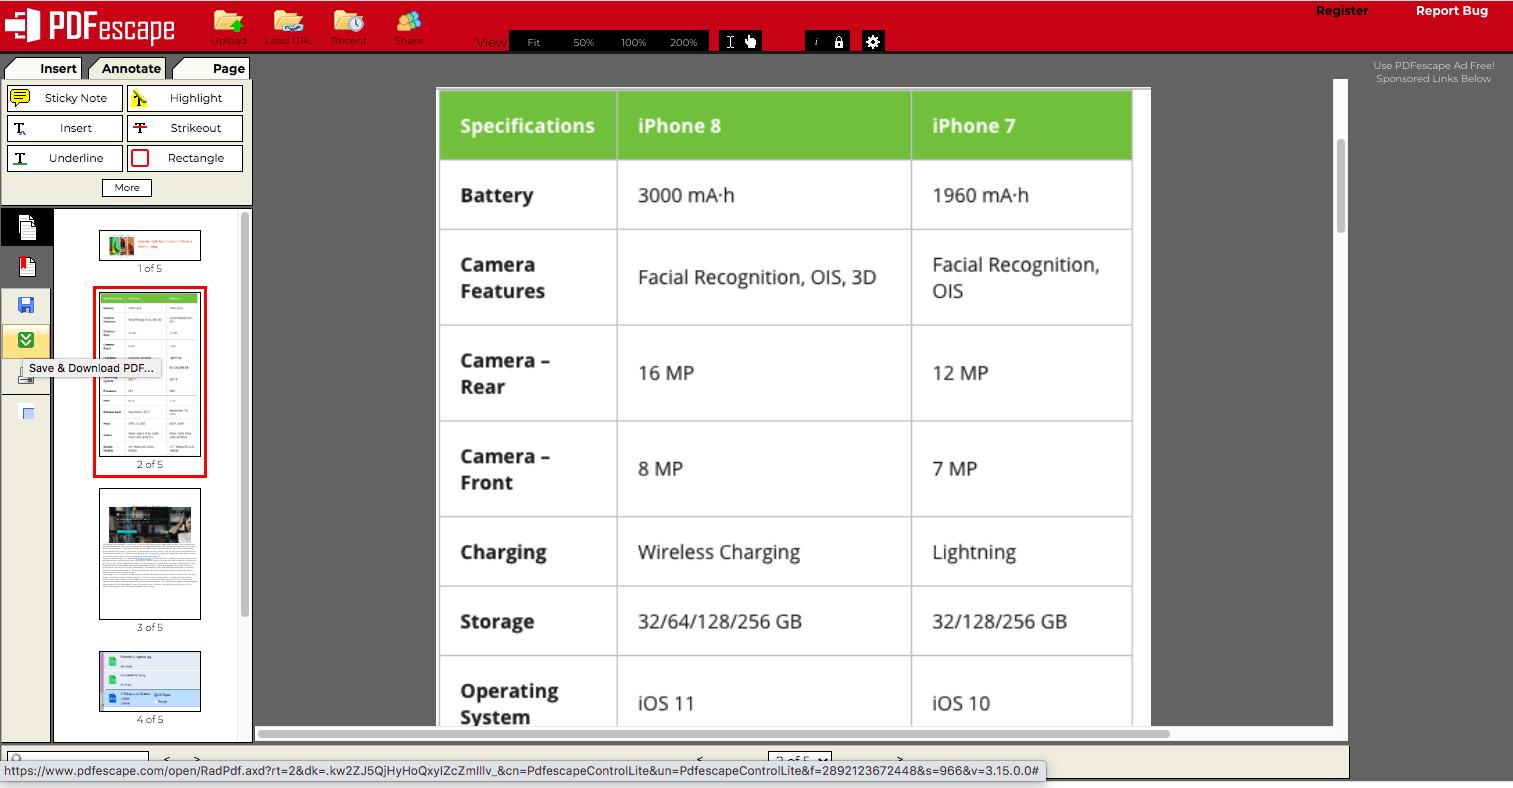 PDFexcape edit pdf file